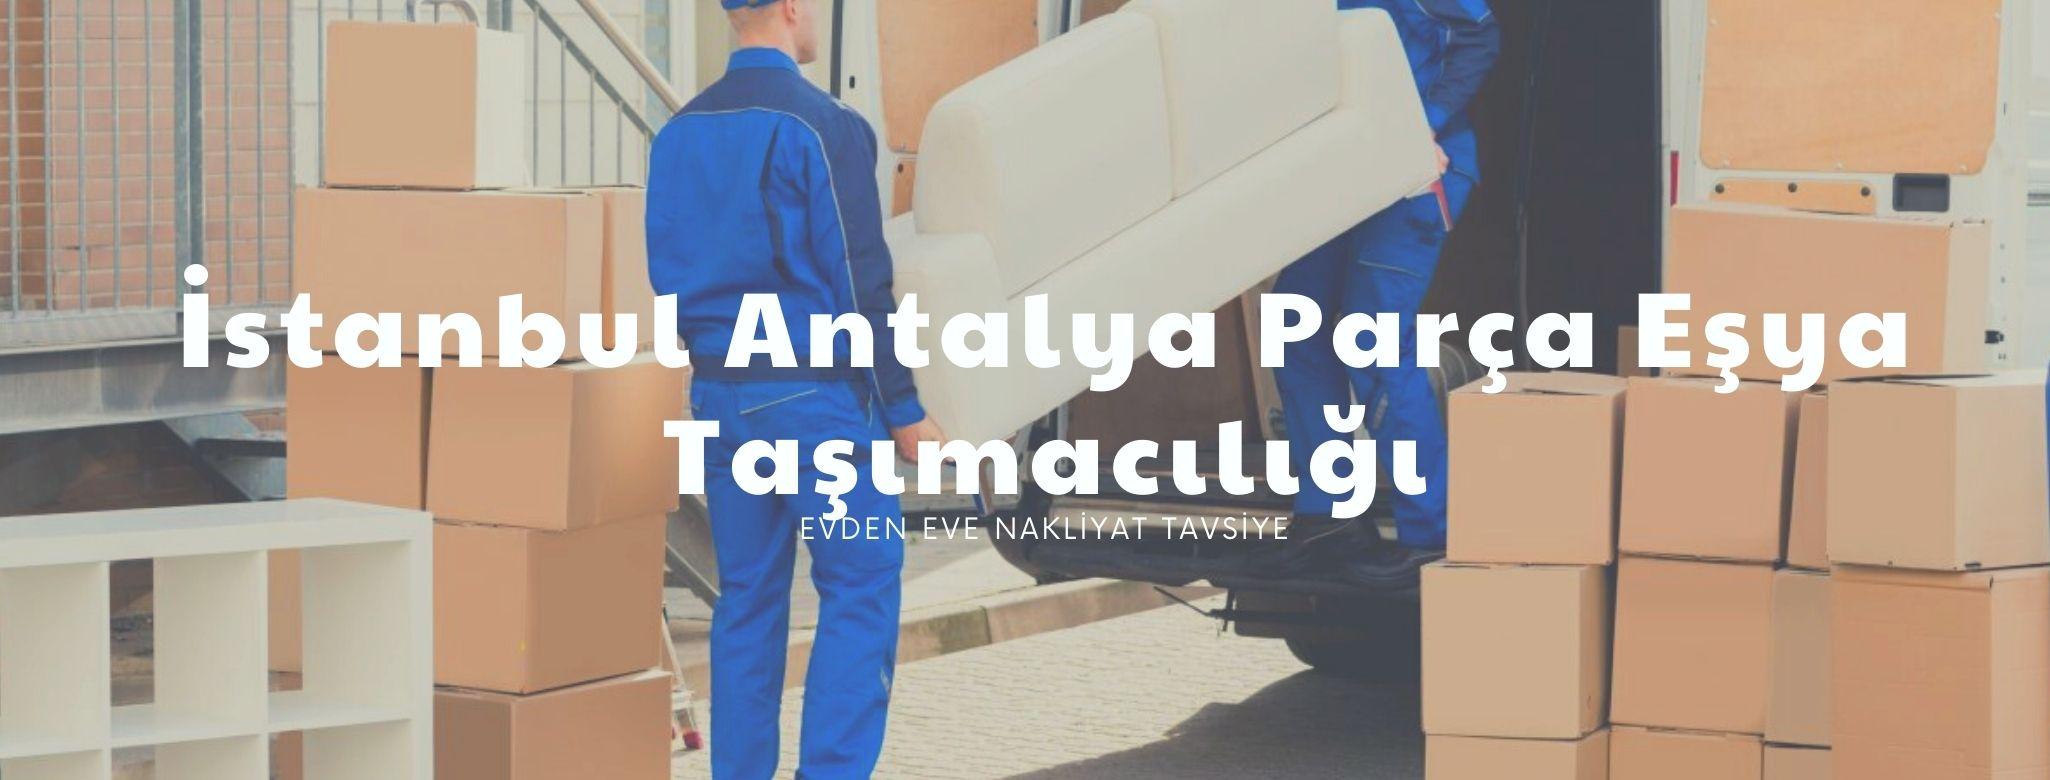 Antalya İstanbul parsiyel taşımacılığı